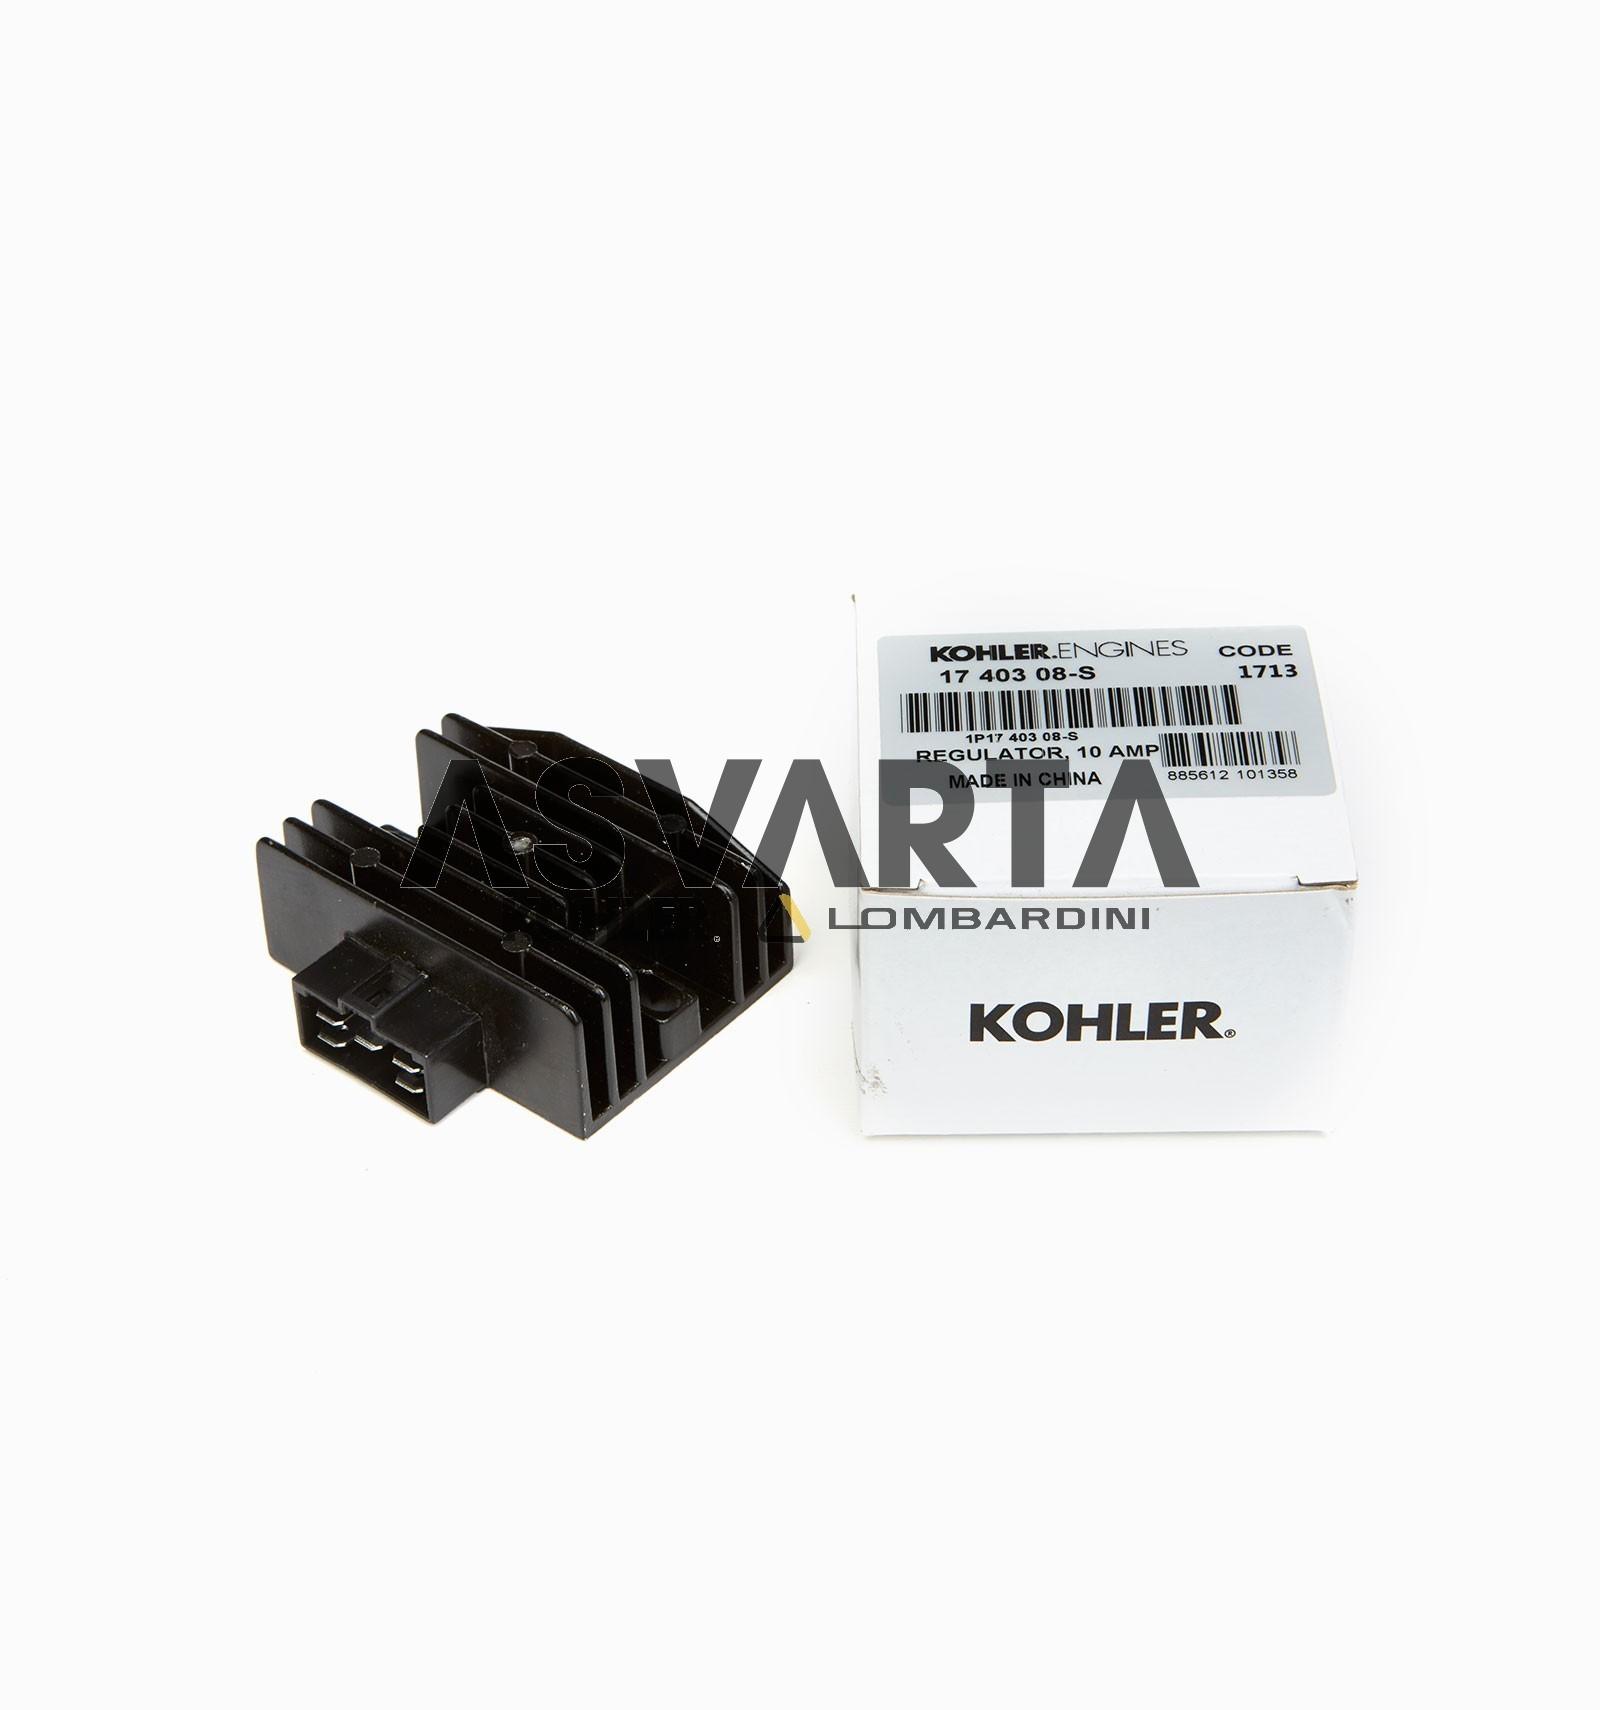 Regulator Kohler Command Pro CH270, CH395, CH440